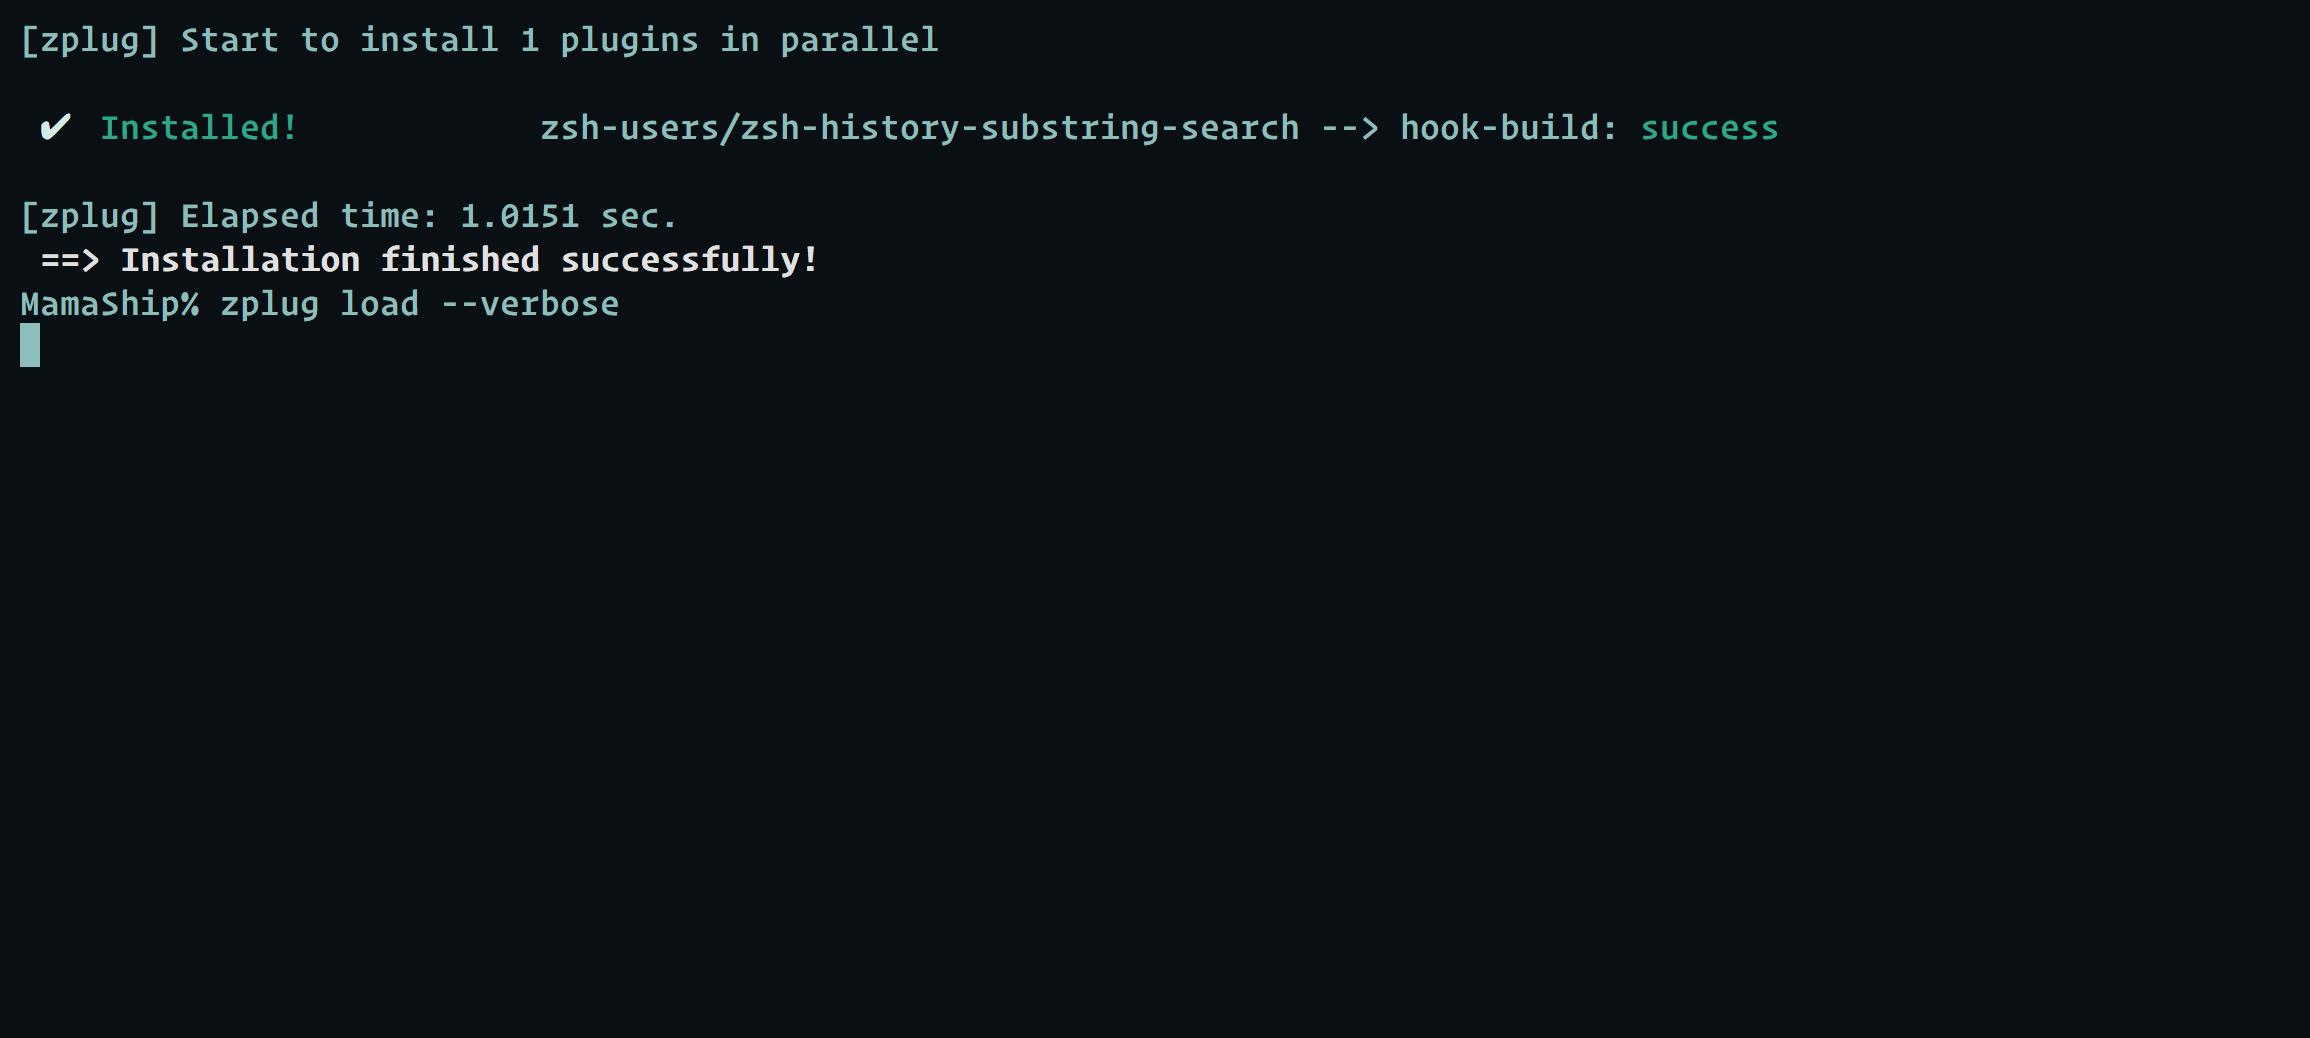 zplug load hangs if hook-build used · Issue #494 · zplug